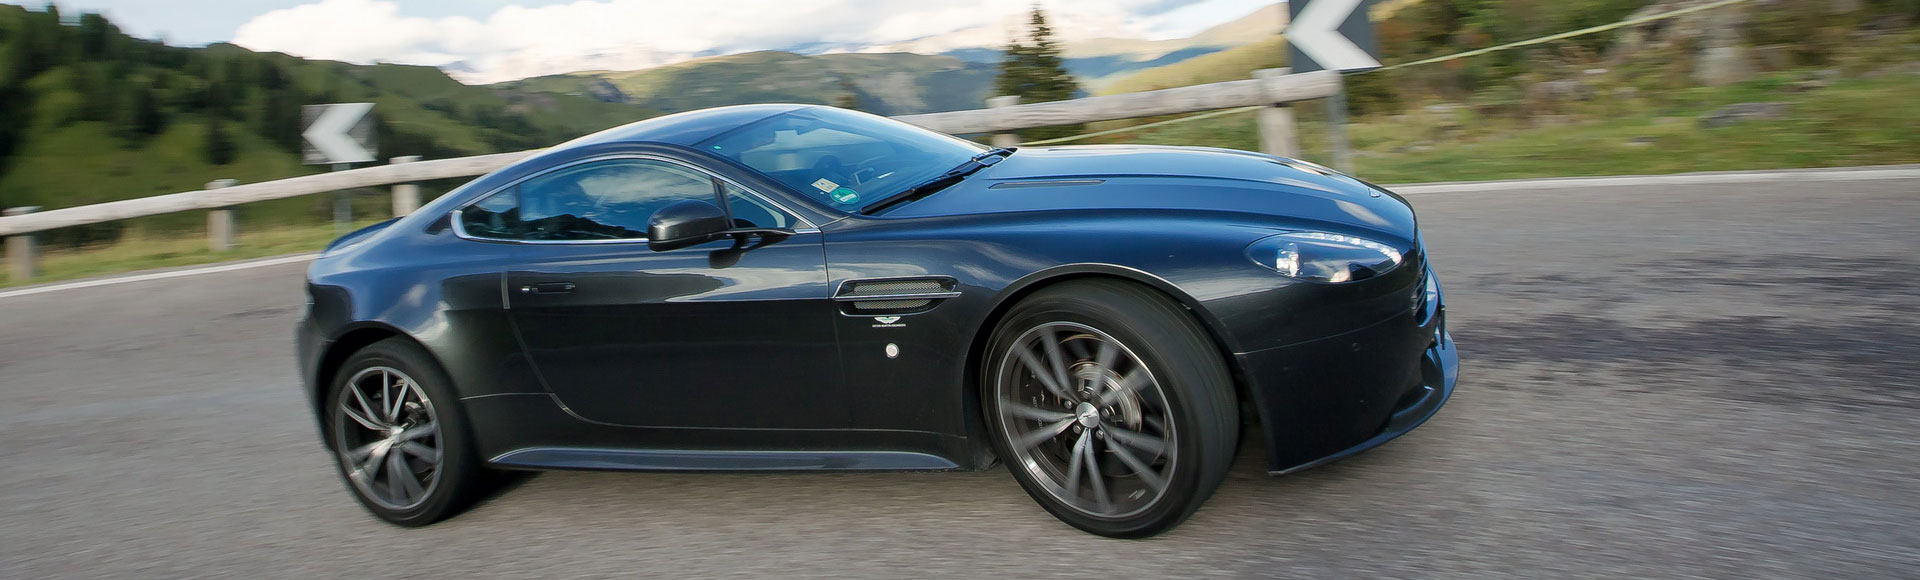 Aston Martin Vantage V8 S SP10 2015 0419 Sommer